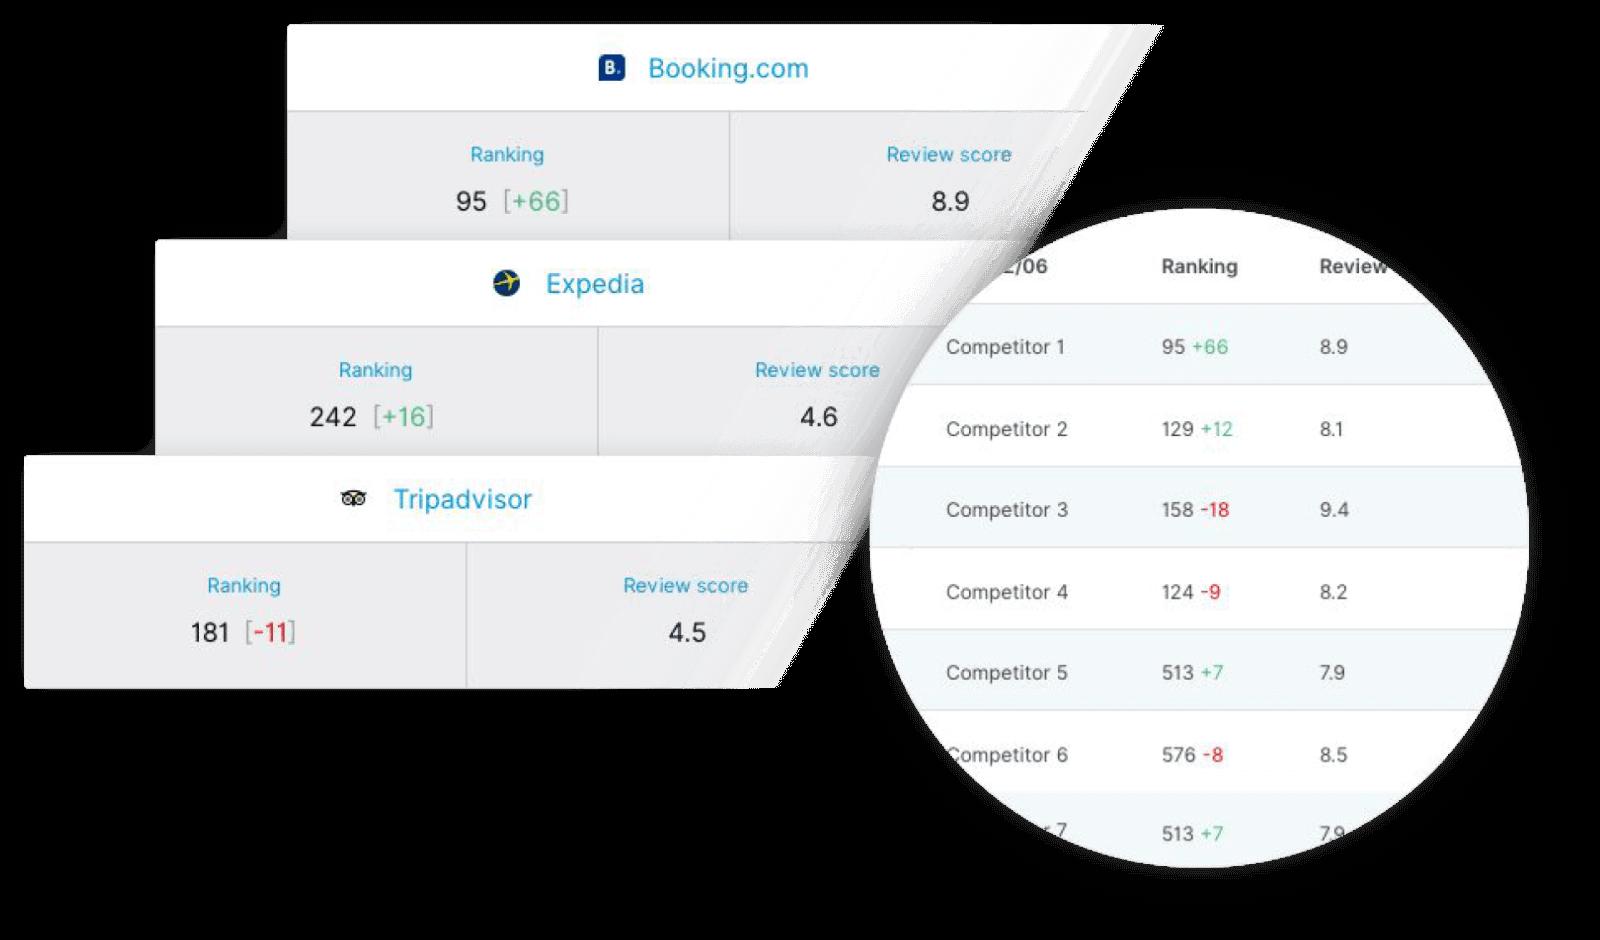 Track your OTA ranking